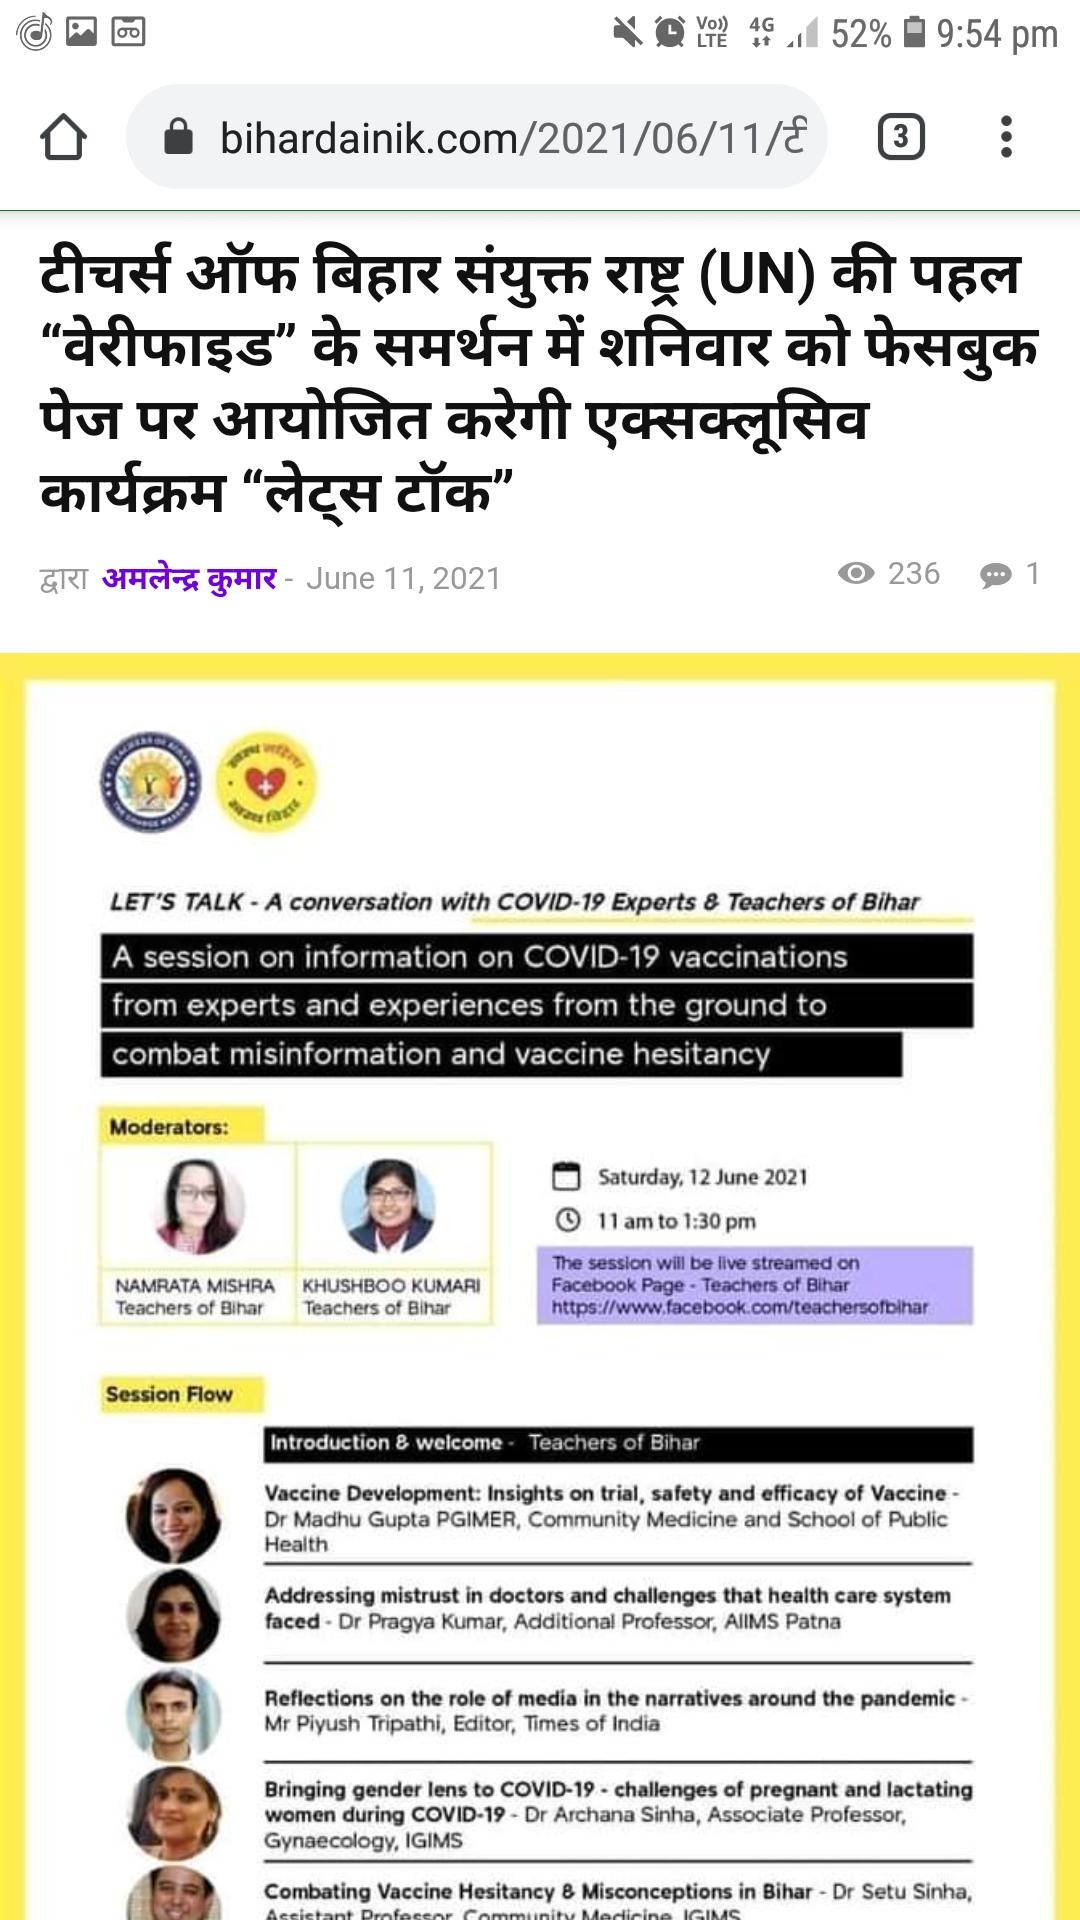 Let's Talk program on covind 19 & vaccination , 11-06-2021